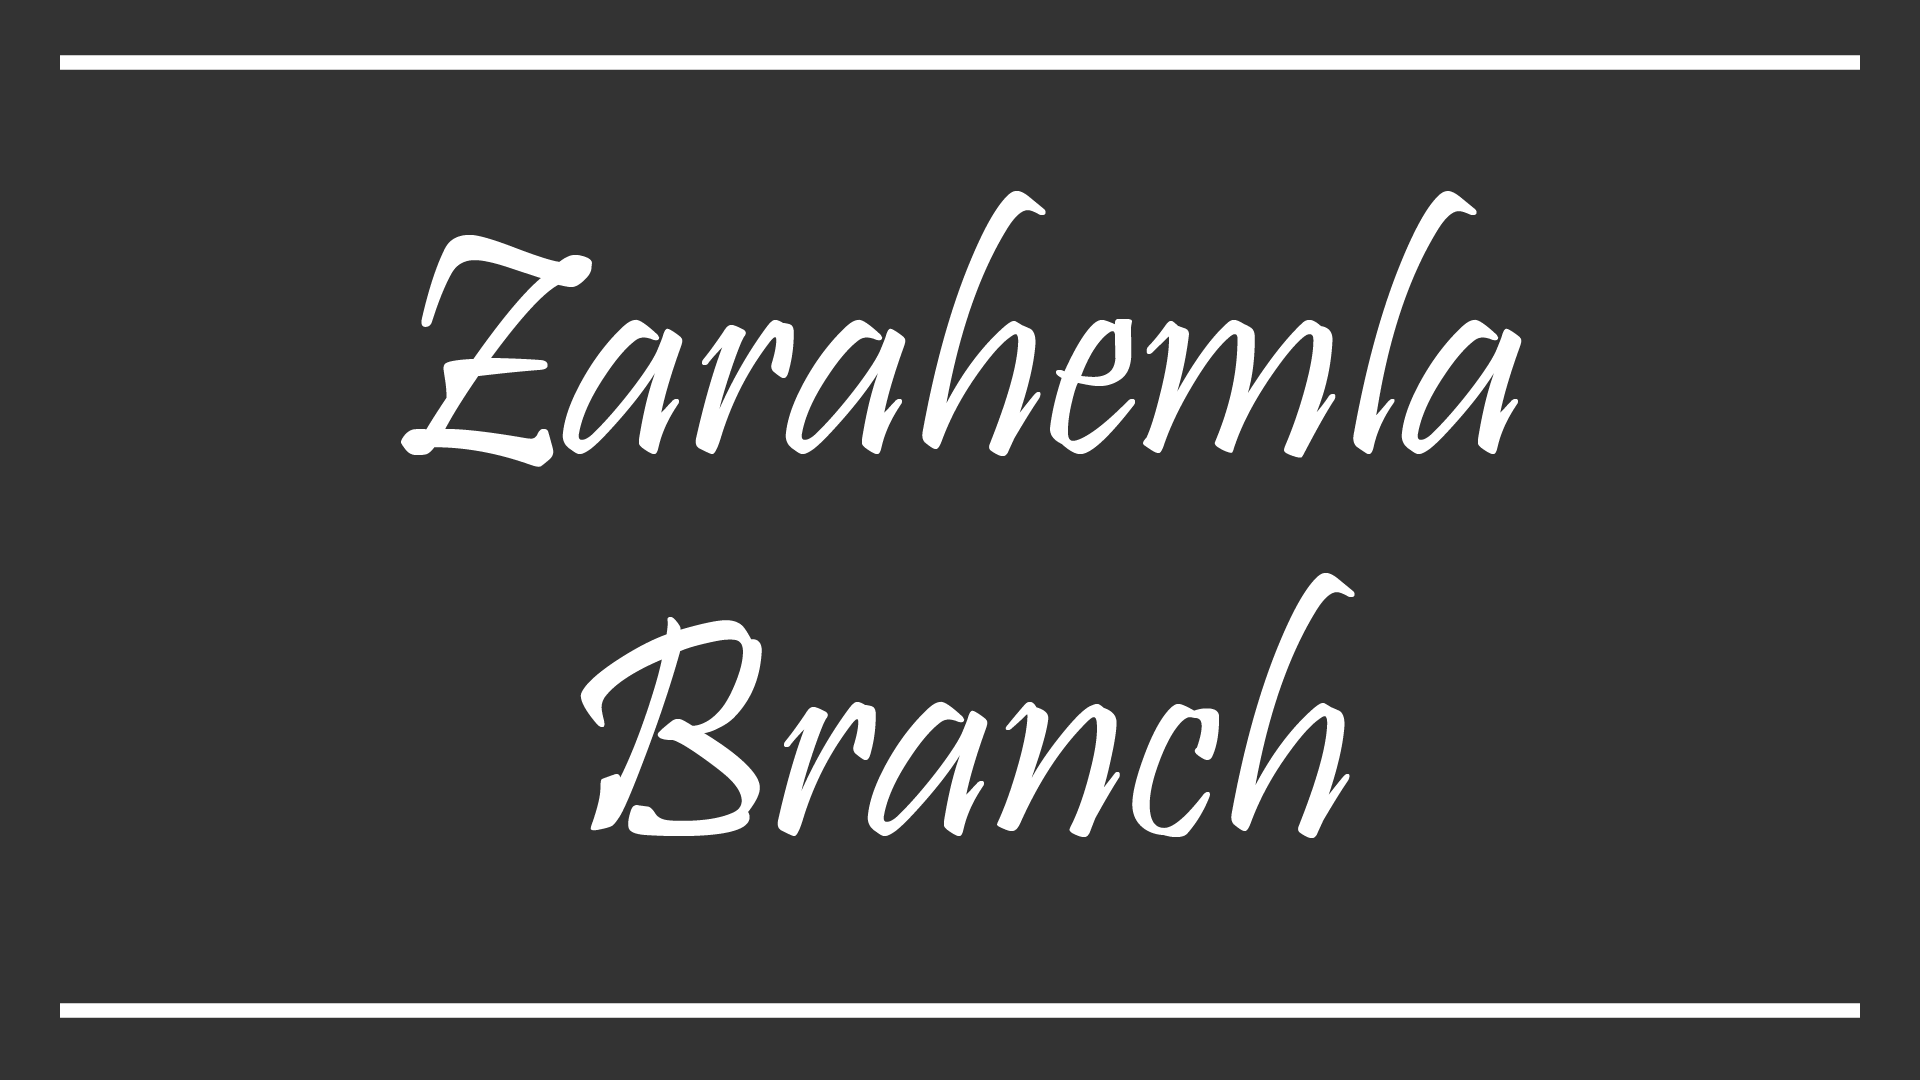 Zarahemla Branch